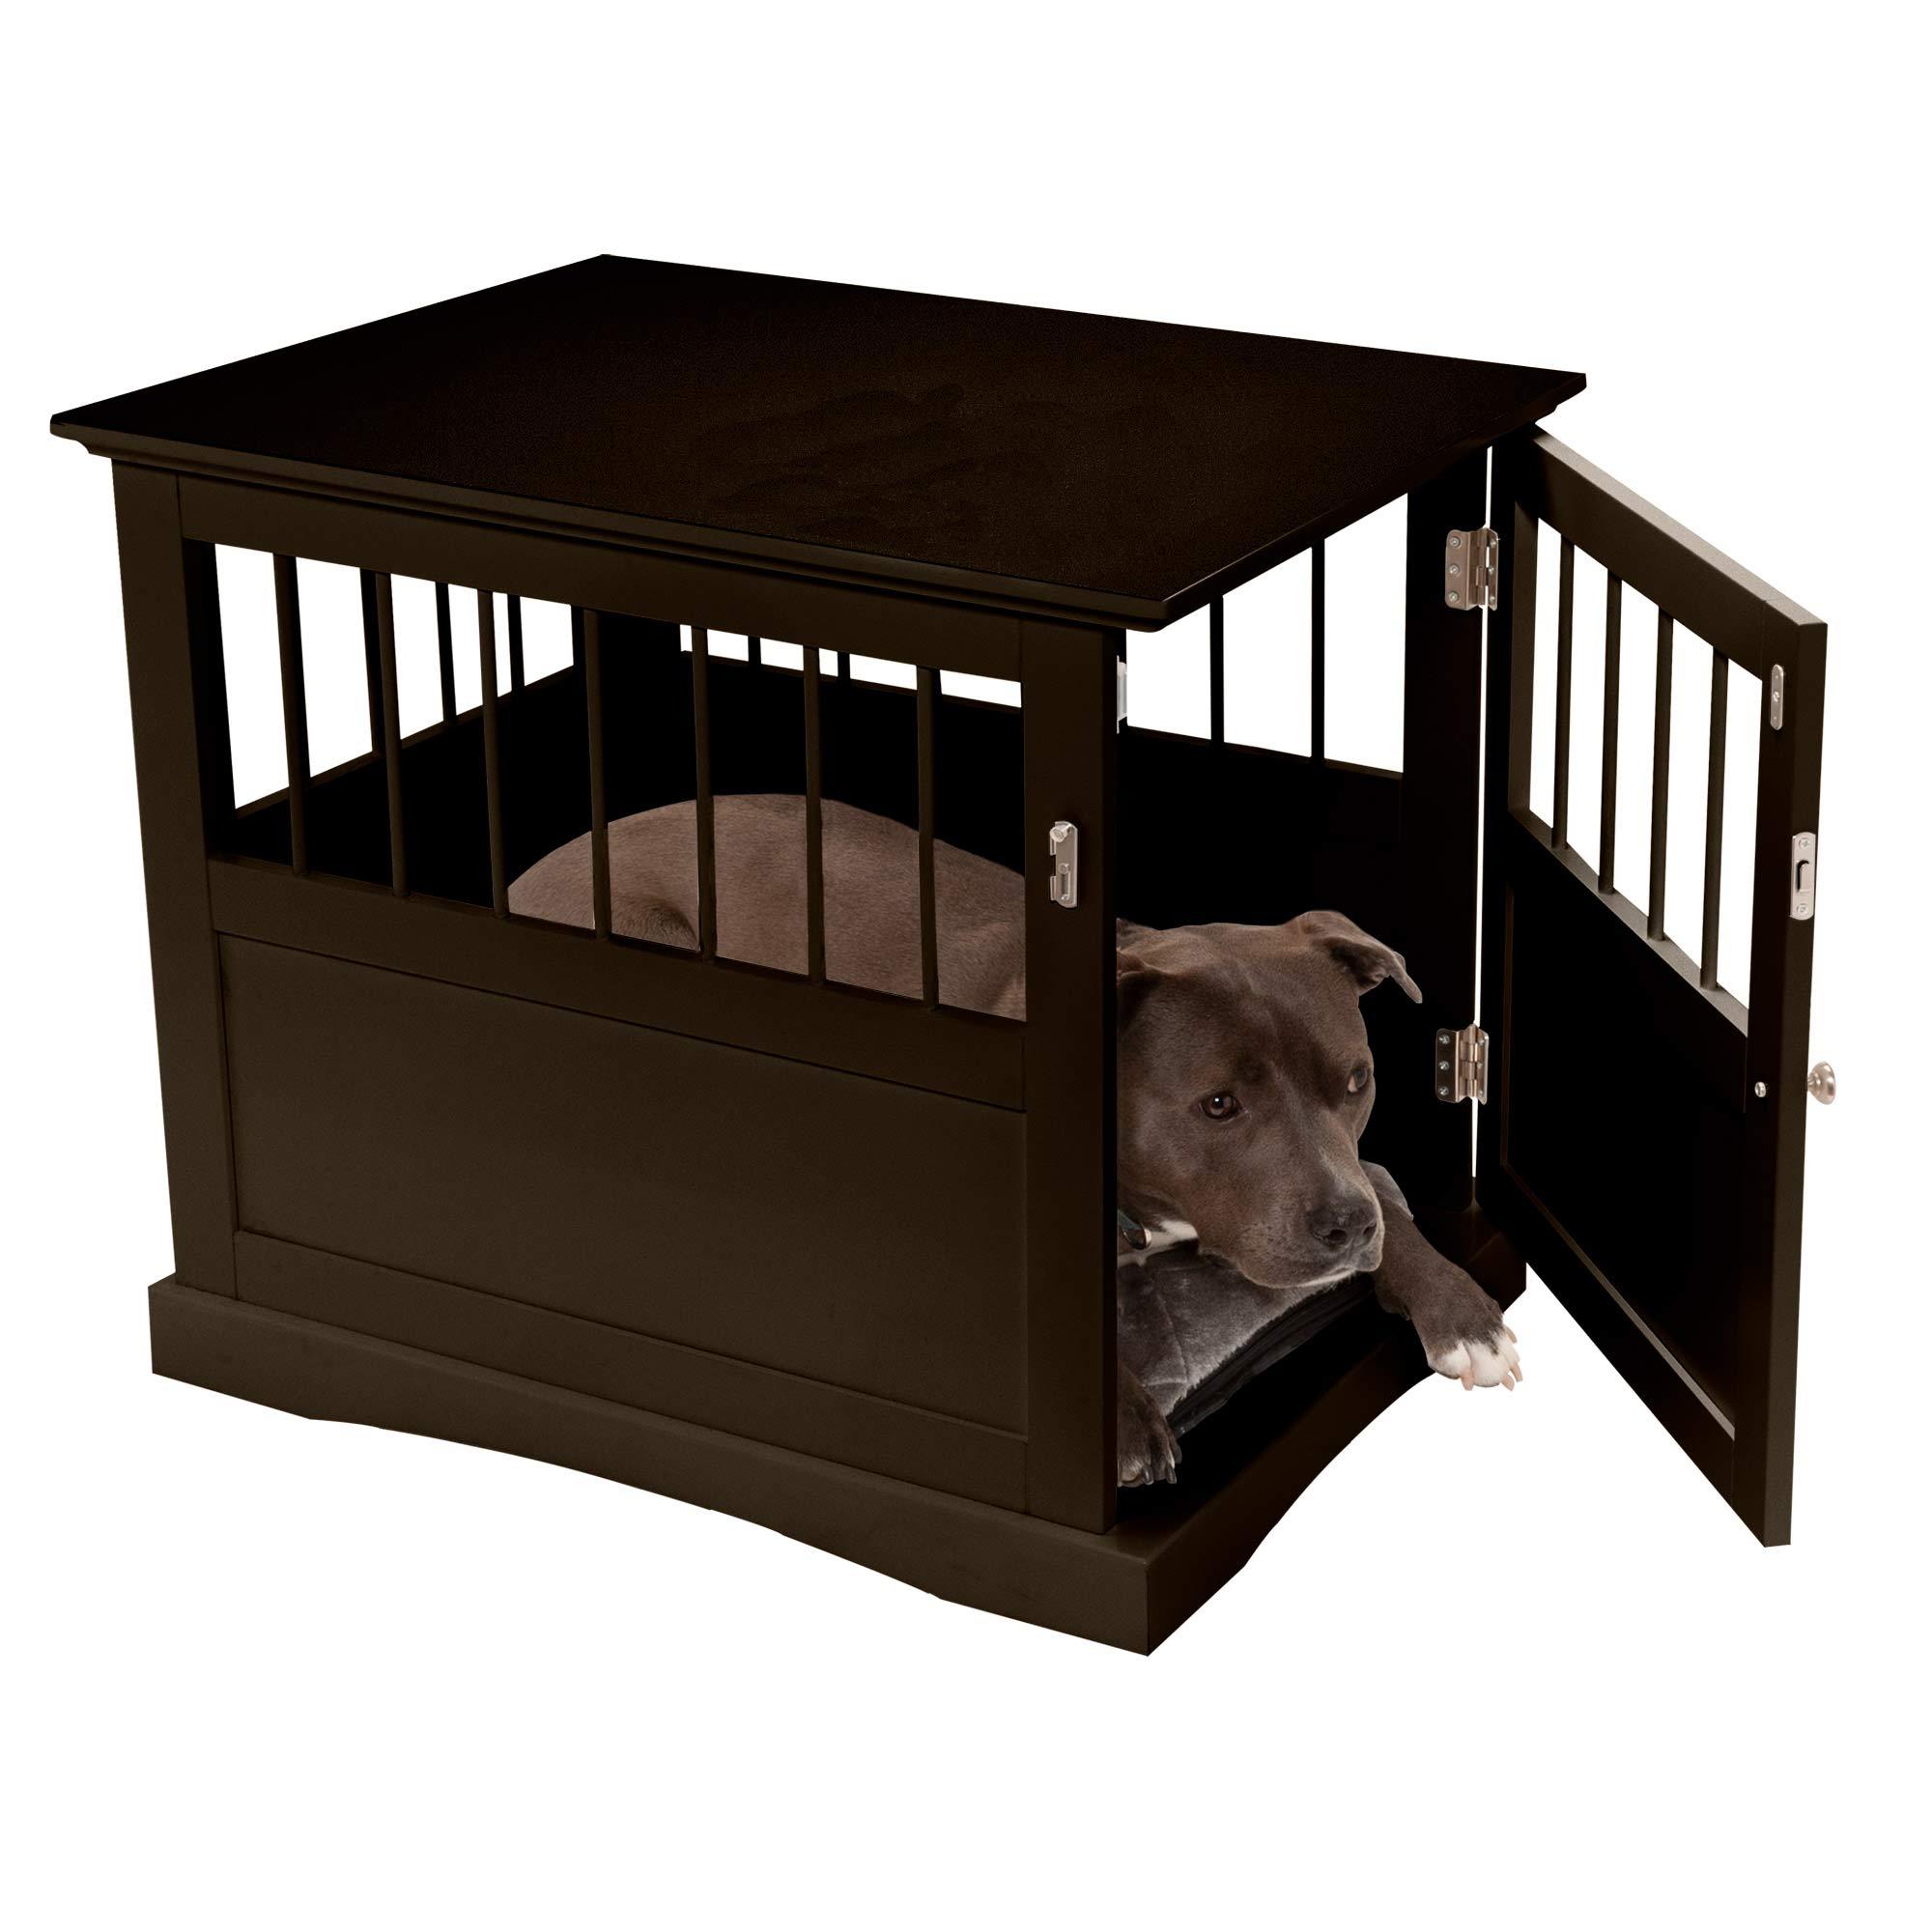 Furhaven Pet – Cat Litter Floor Mat Protector, Litter Box Storage Cabinet, & Secure Living Room Dog Crate End Table for…